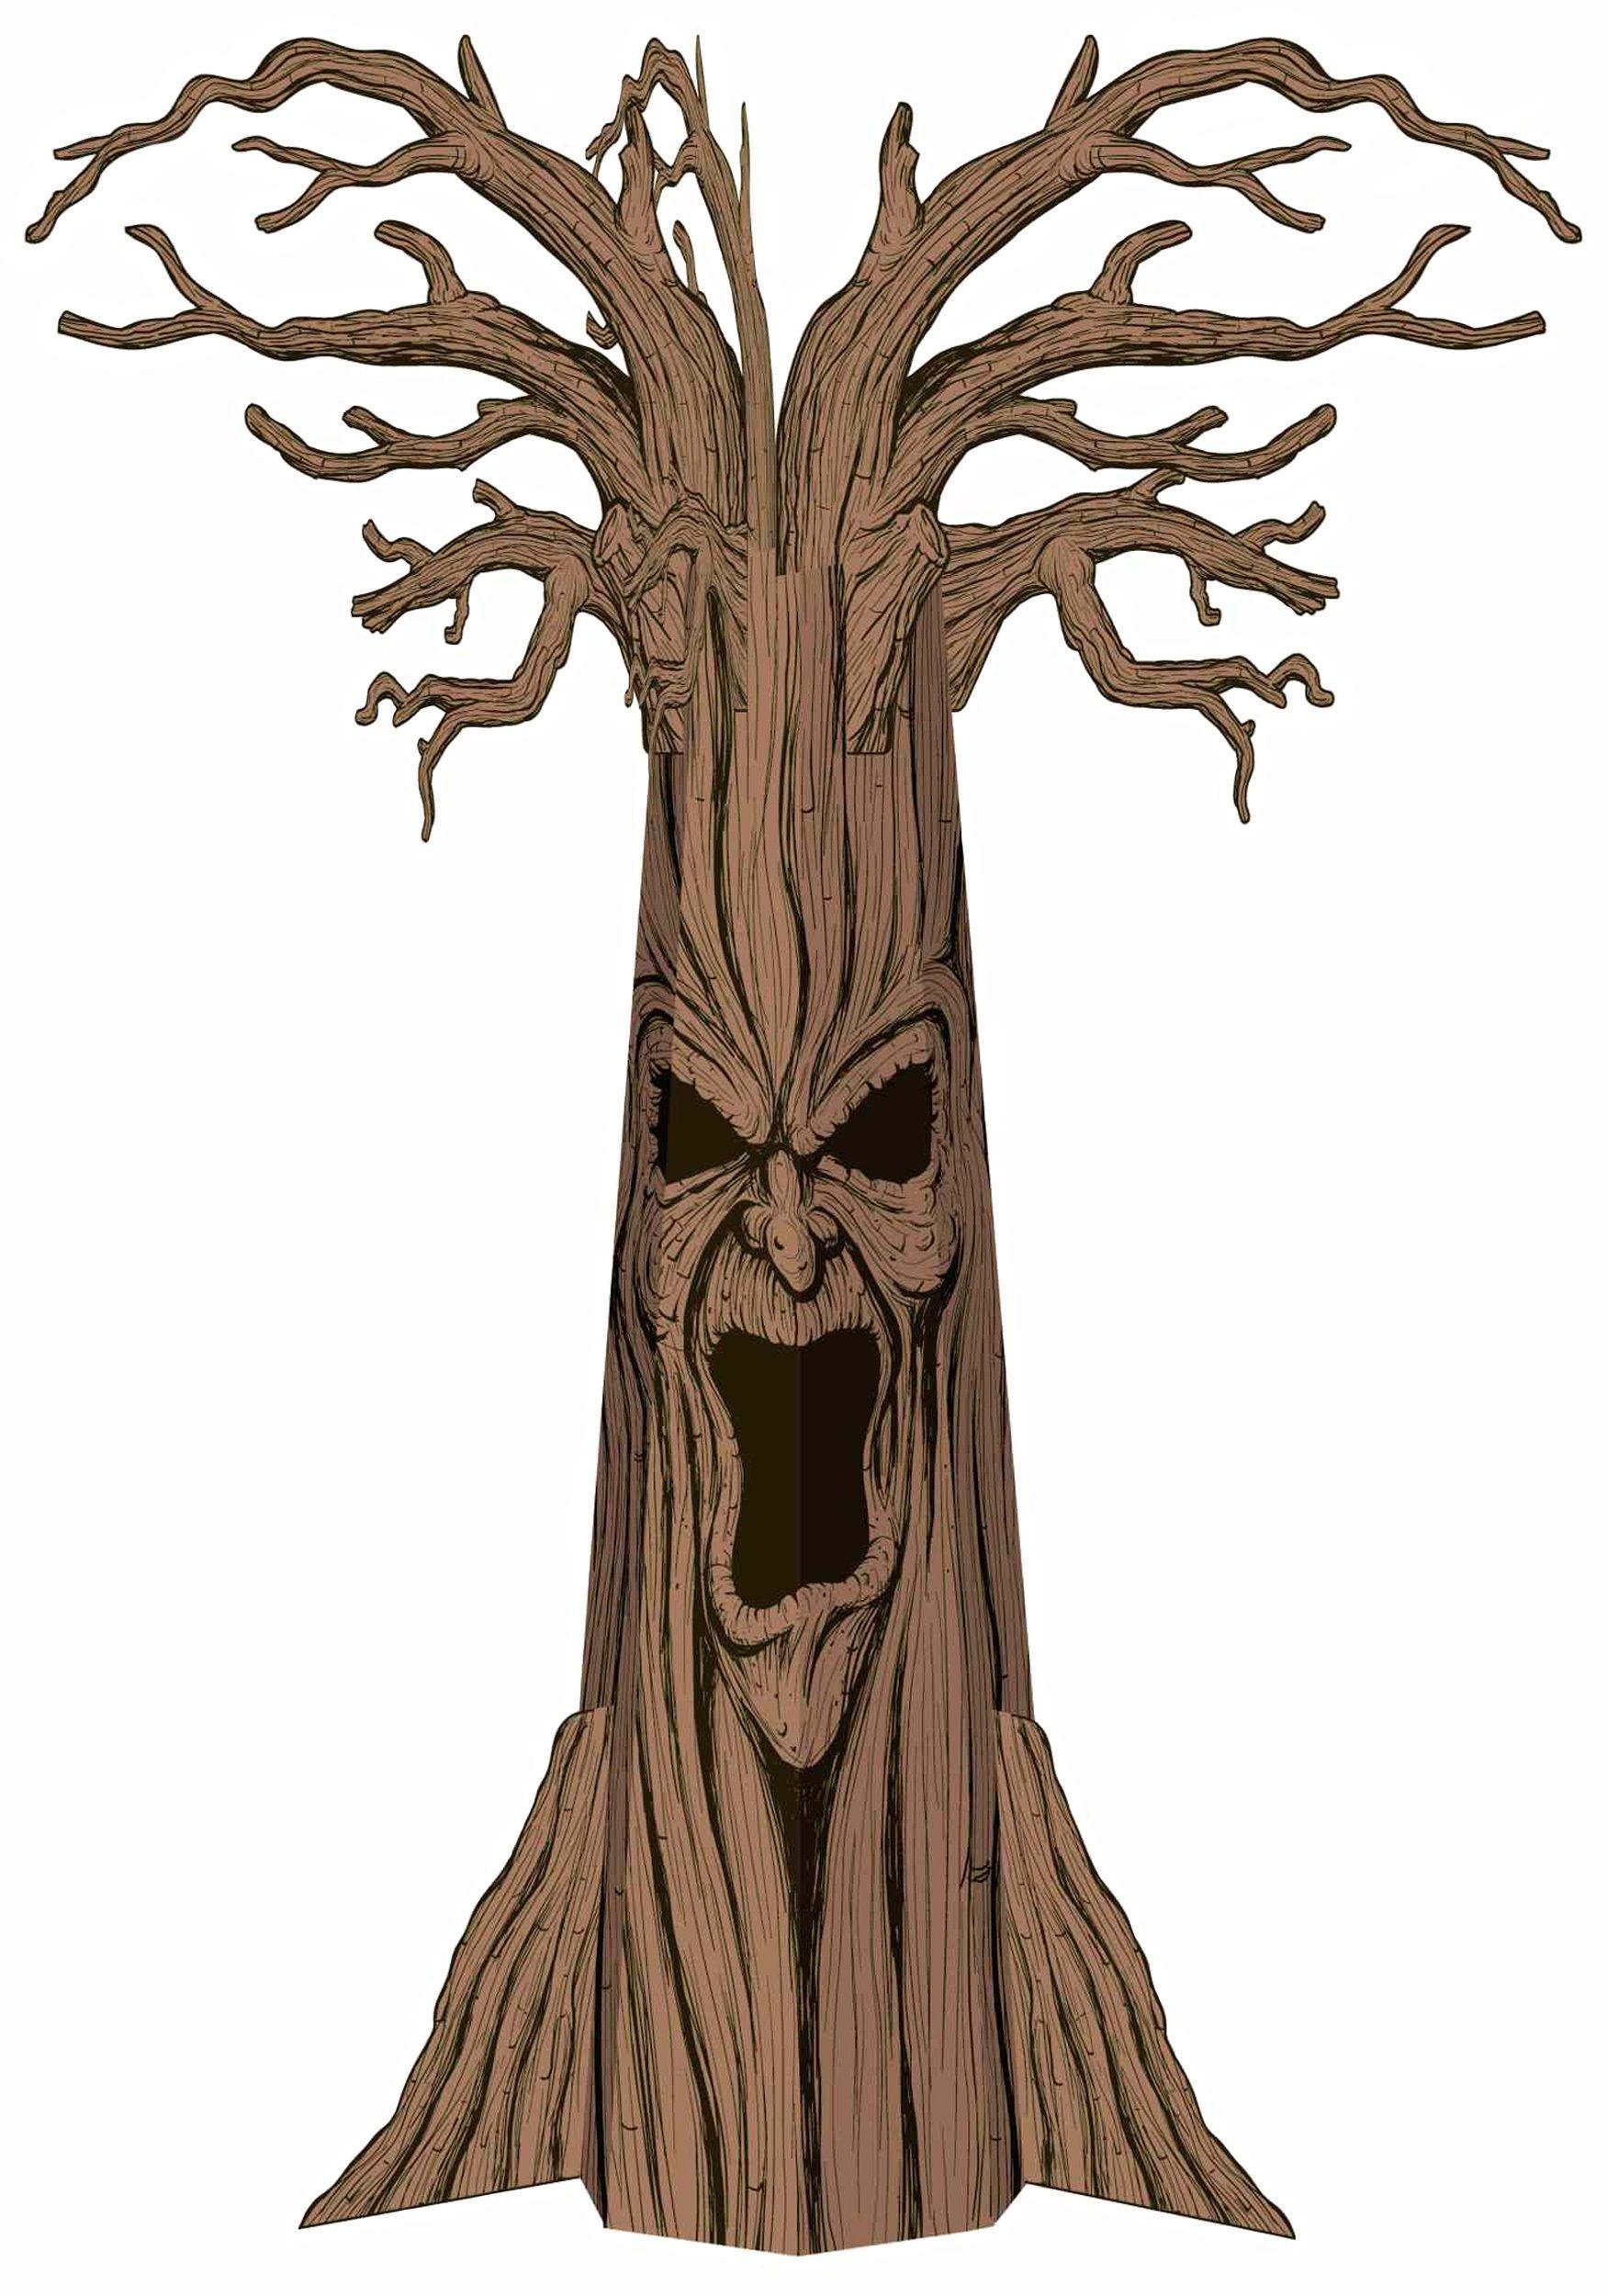 Spooky halloween tree decoration - Haunted Tree Decoration